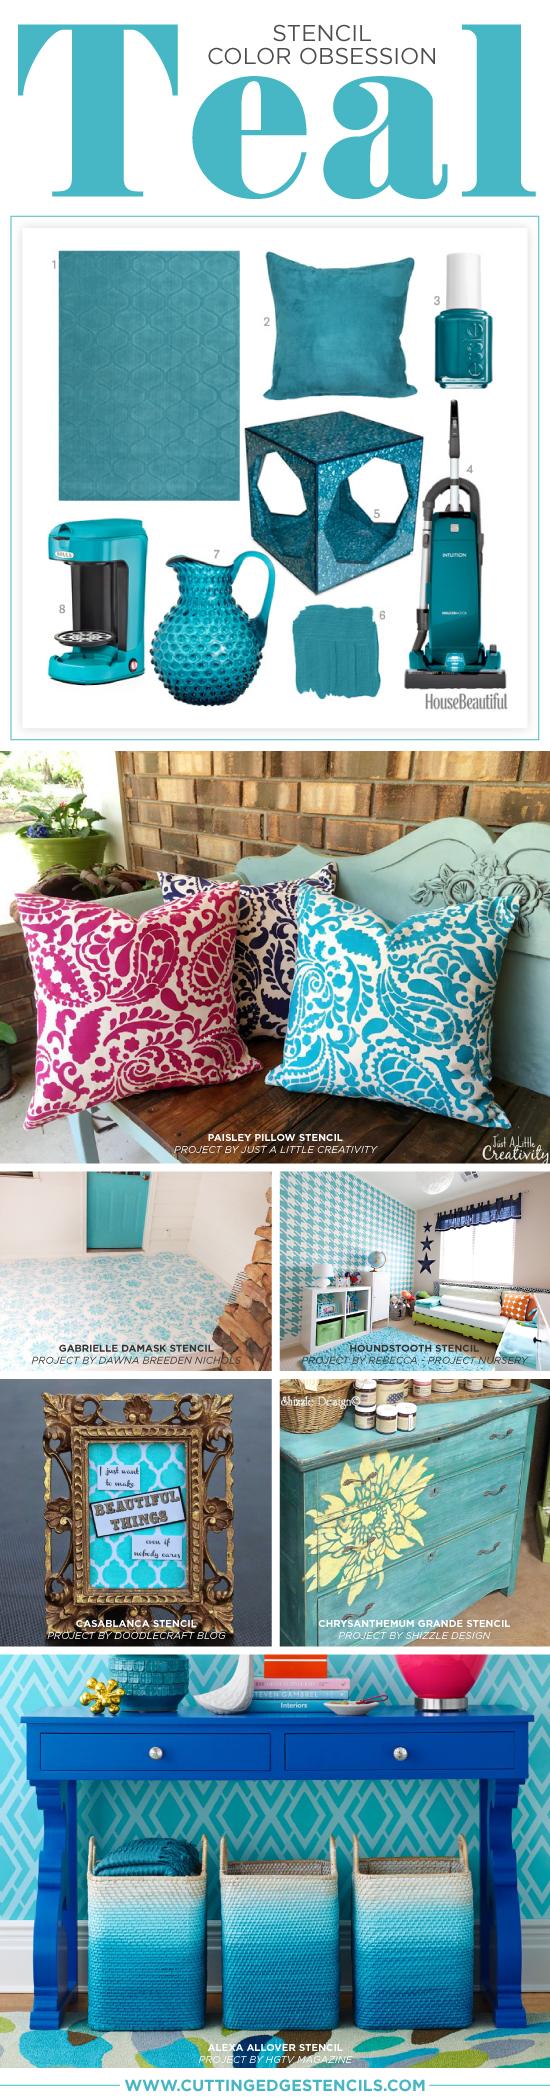 Cutting Edge Stencils shares DIY stenciled teal home decor and room ideas. http://www.cuttingedgestencils.com/wall-stencils-stencil-designs.html